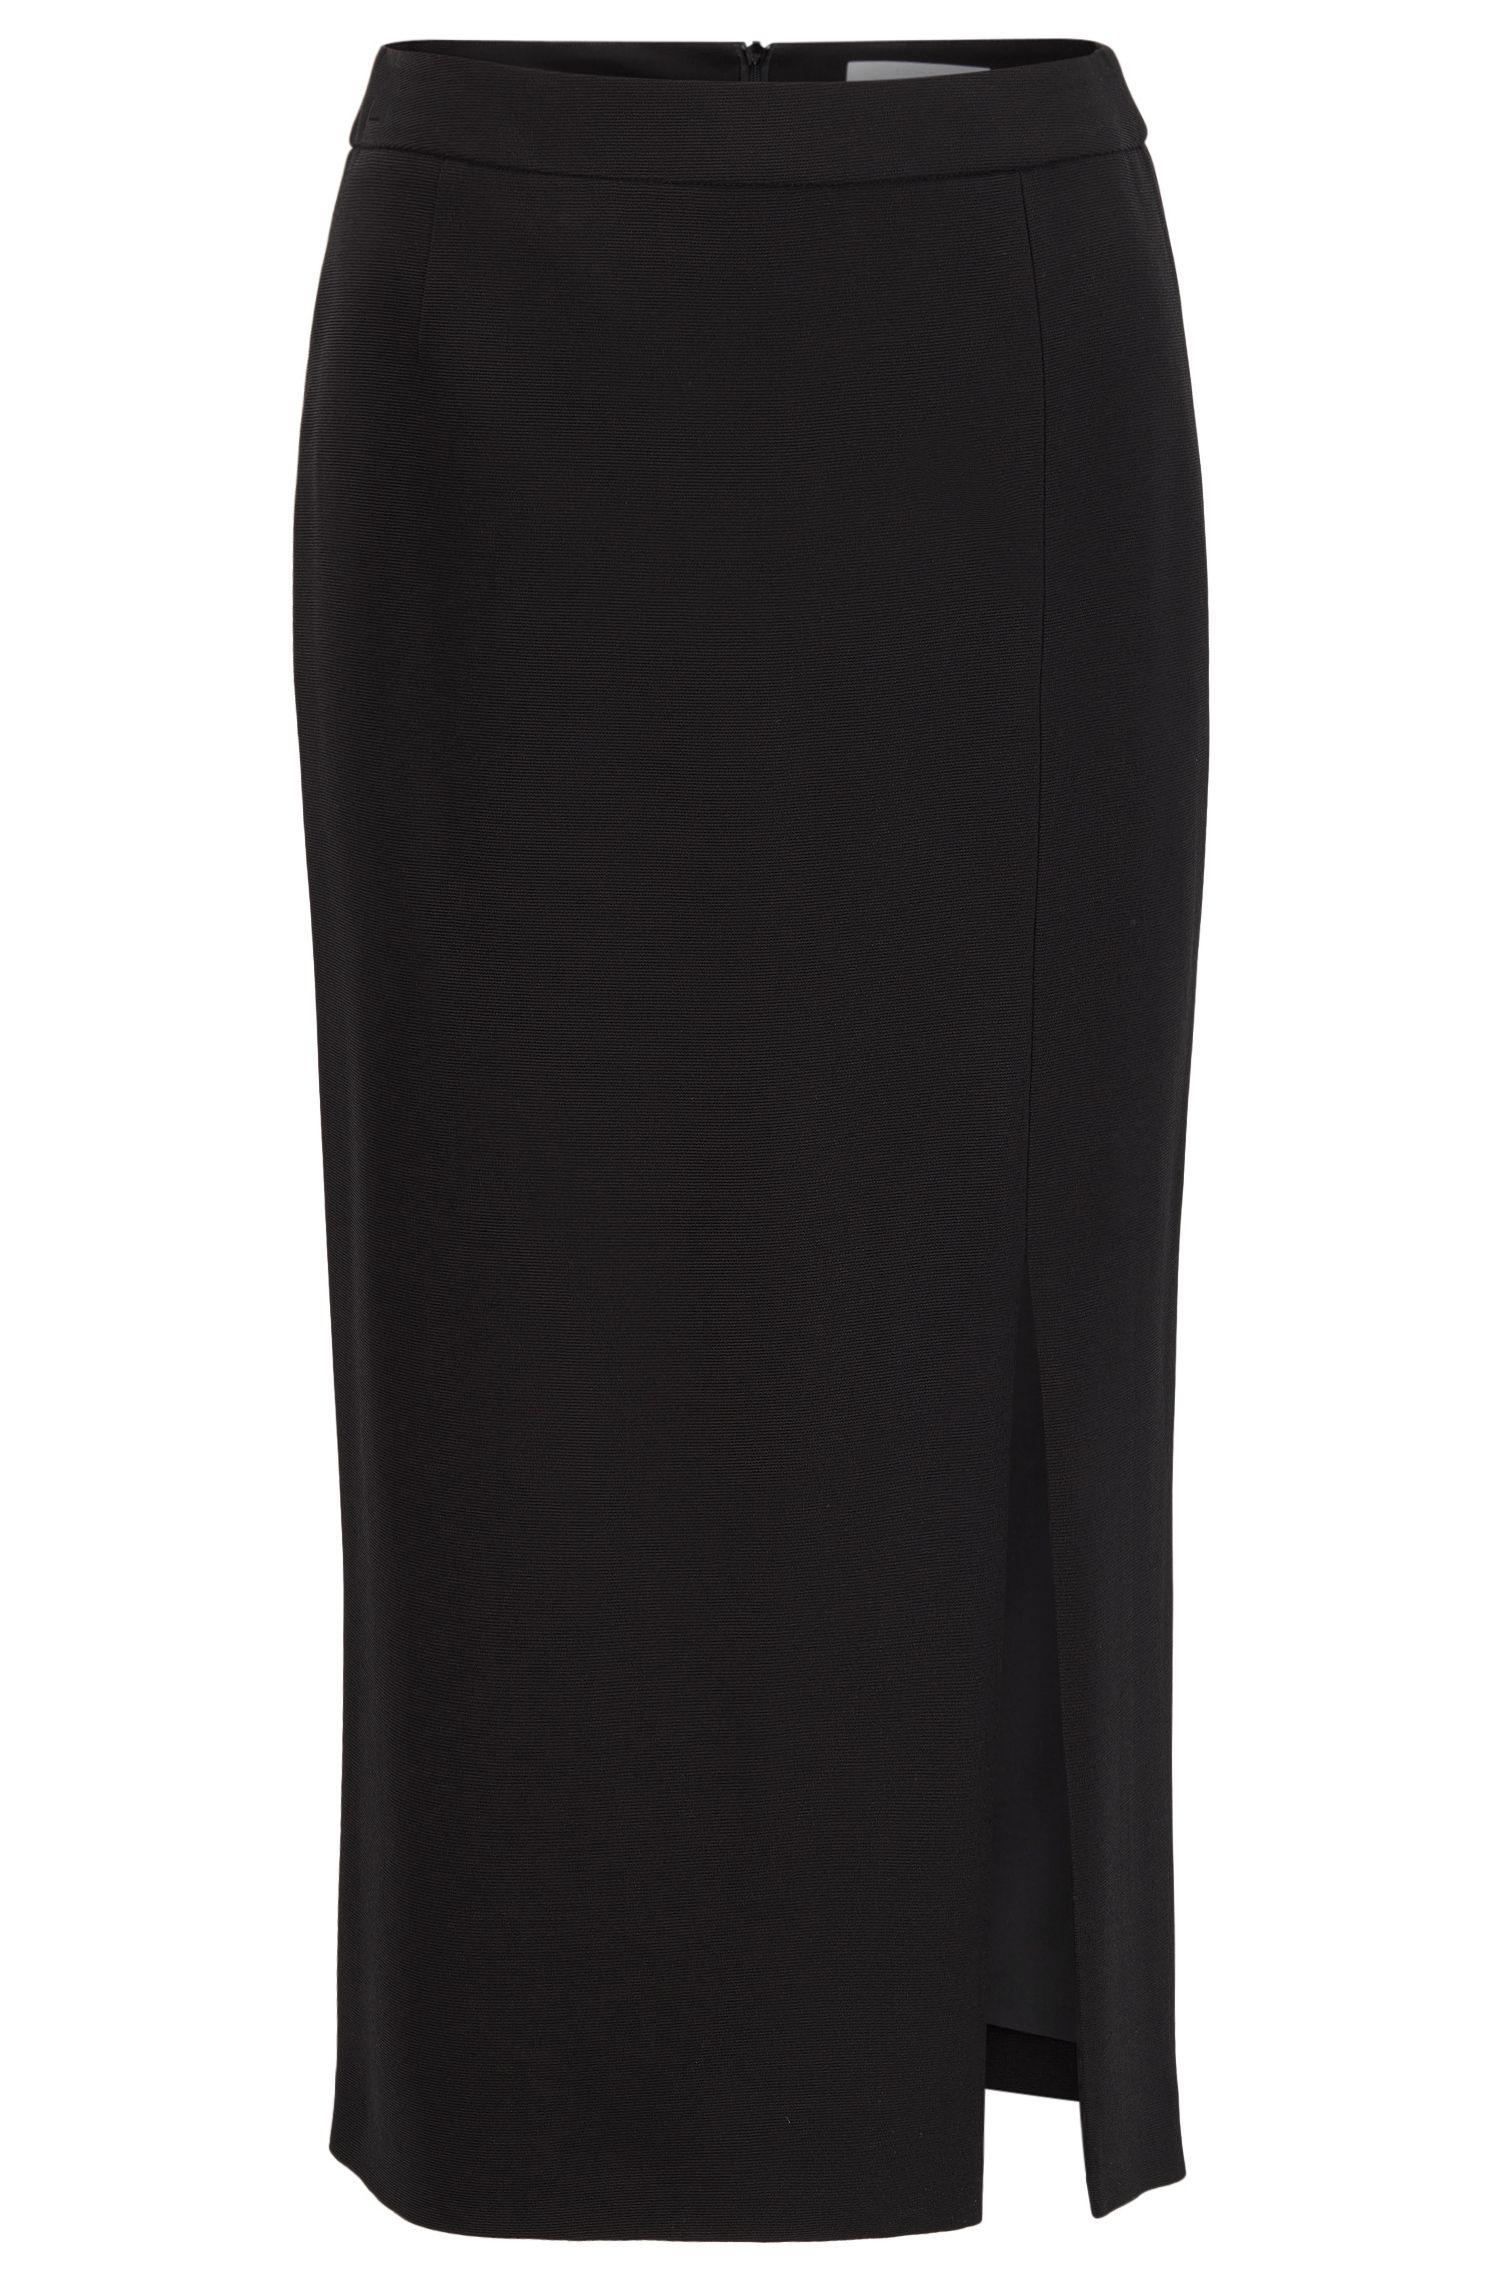 Long-length pencil skirt in ottoman fabric